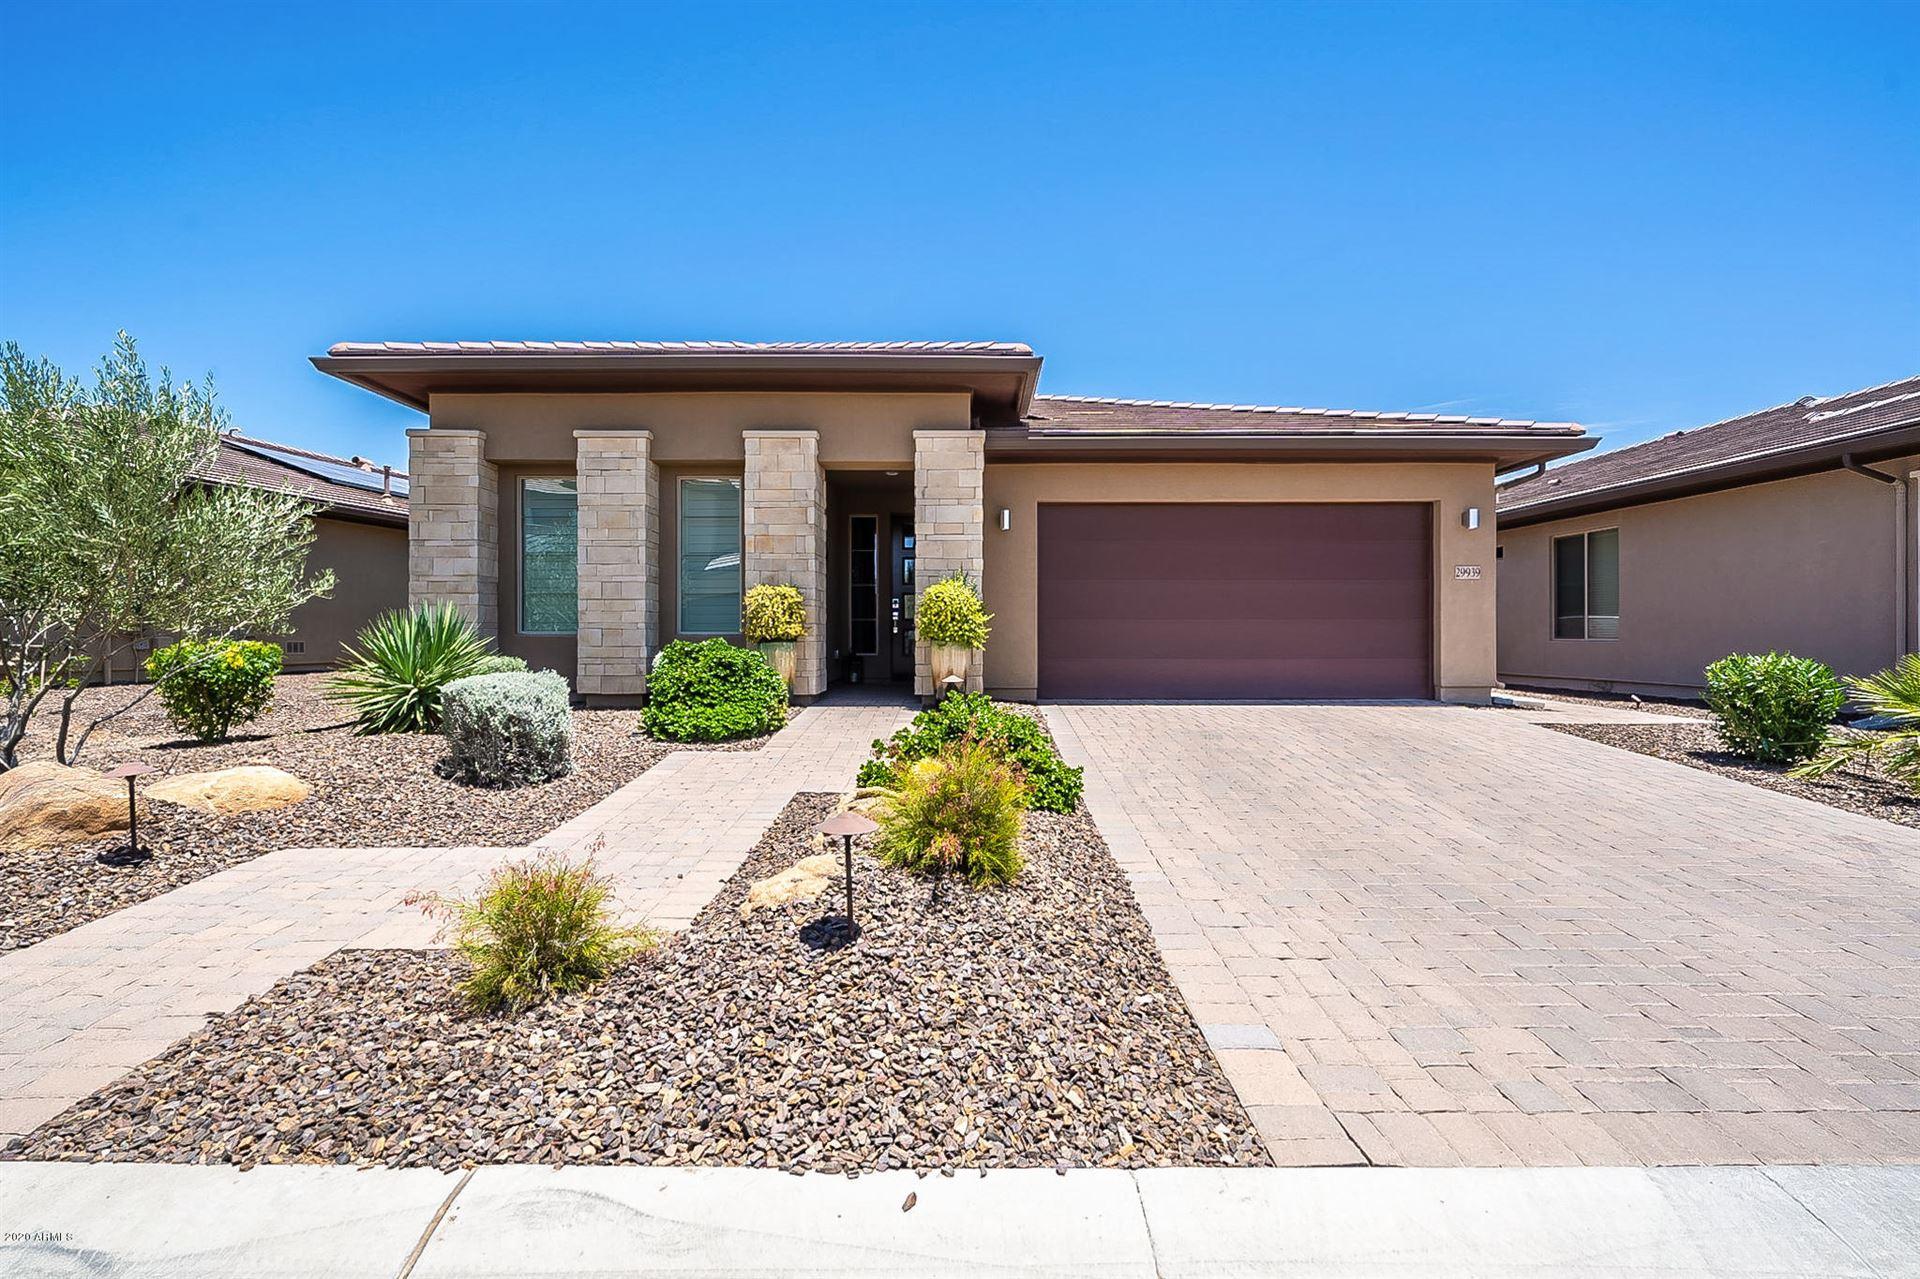 Photo of 29939 N 134TH Drive, Peoria, AZ 85383 (MLS # 6296557)